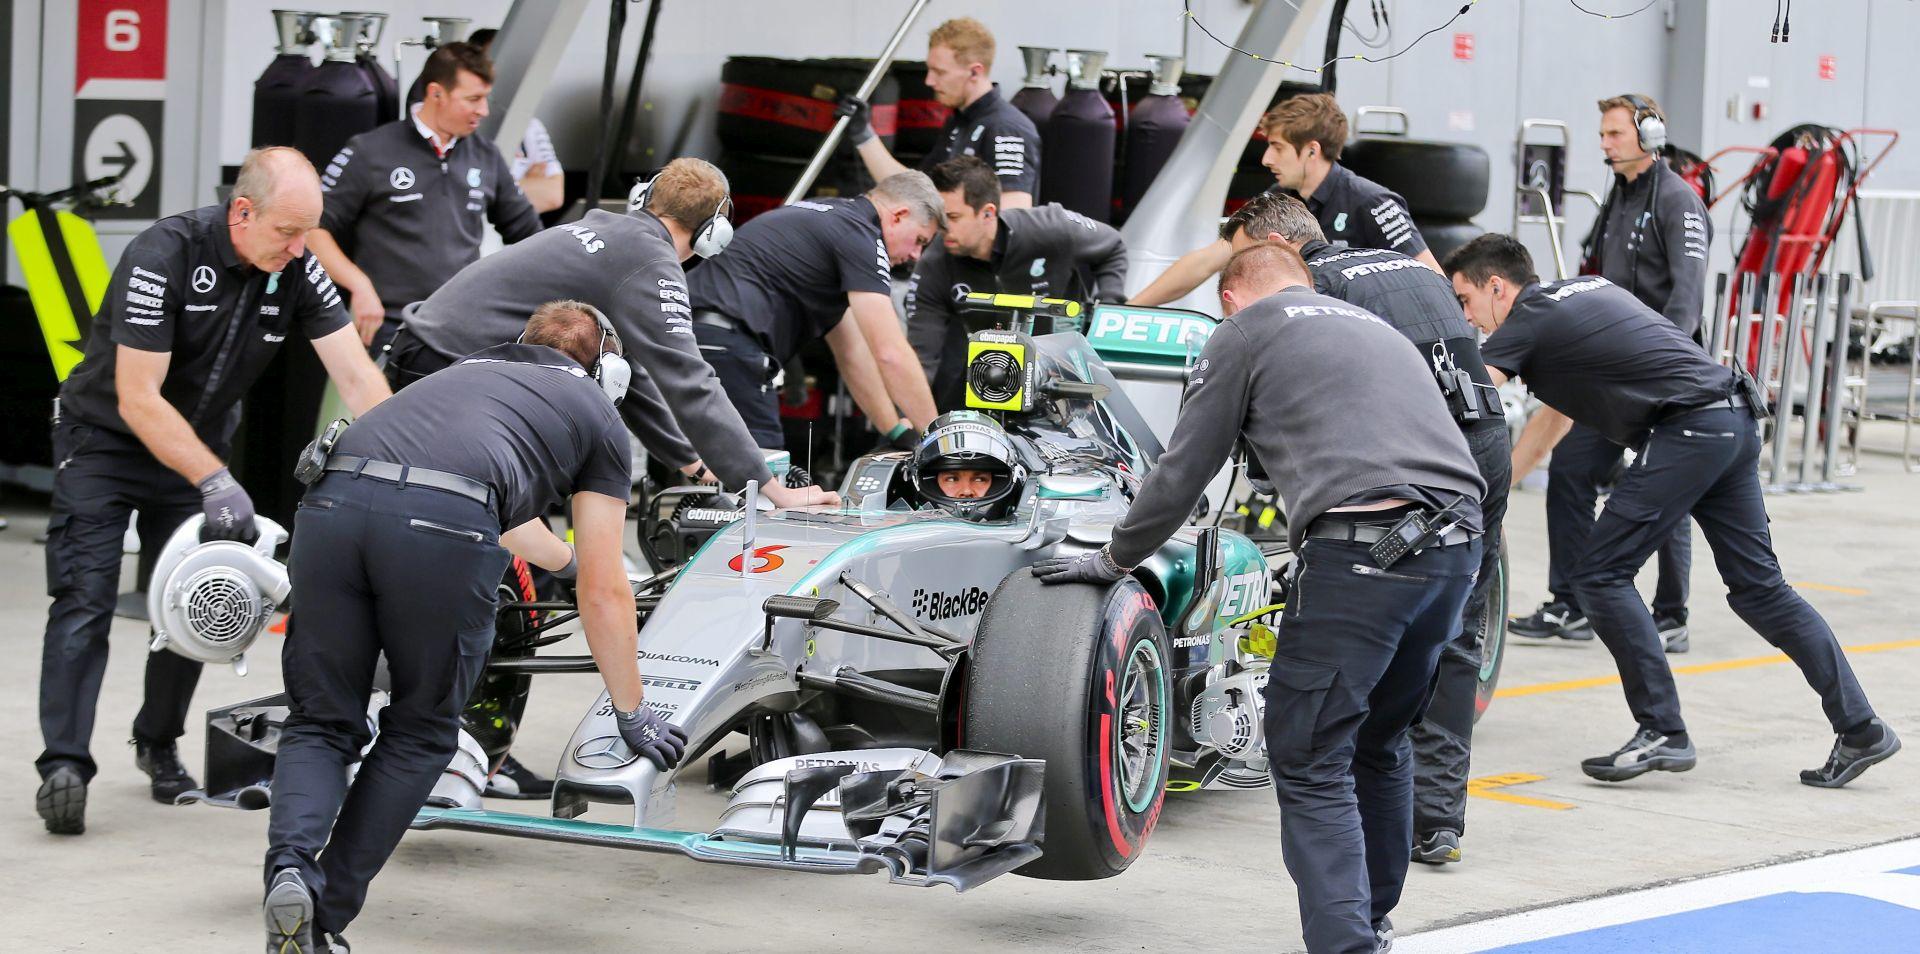 VELIKA NAGRADA RUSIJE Rosbergu prva startna pozicija, Hamilton kreće drugi